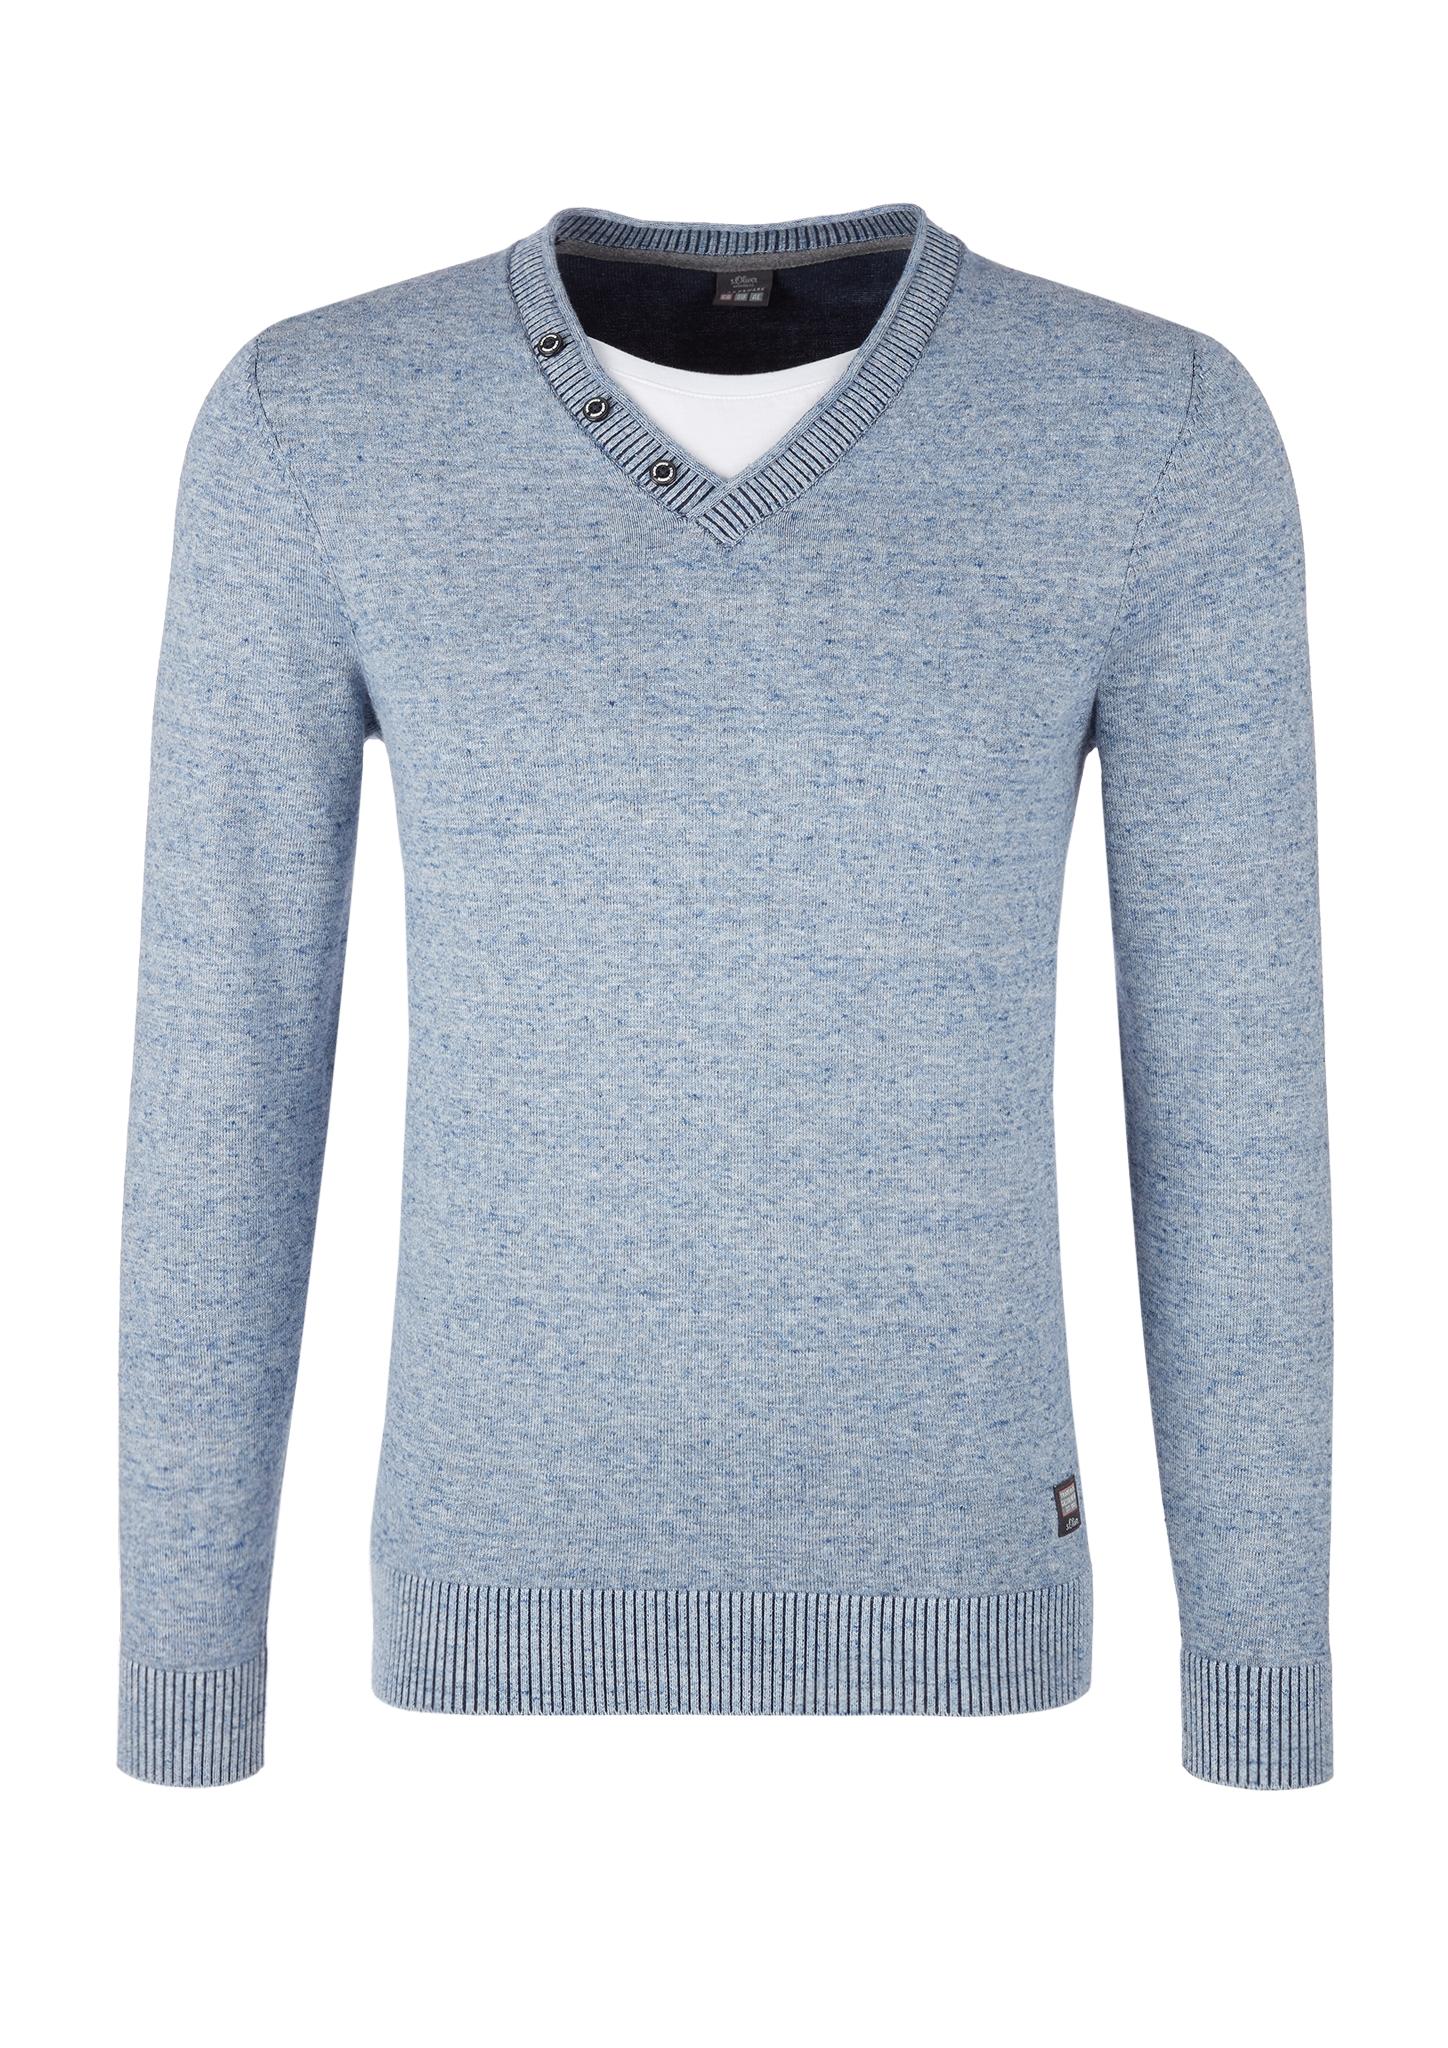 Pullover | Bekleidung > Pullover > Sonstige Pullover | Blau | 100% baumwolle | s.Oliver